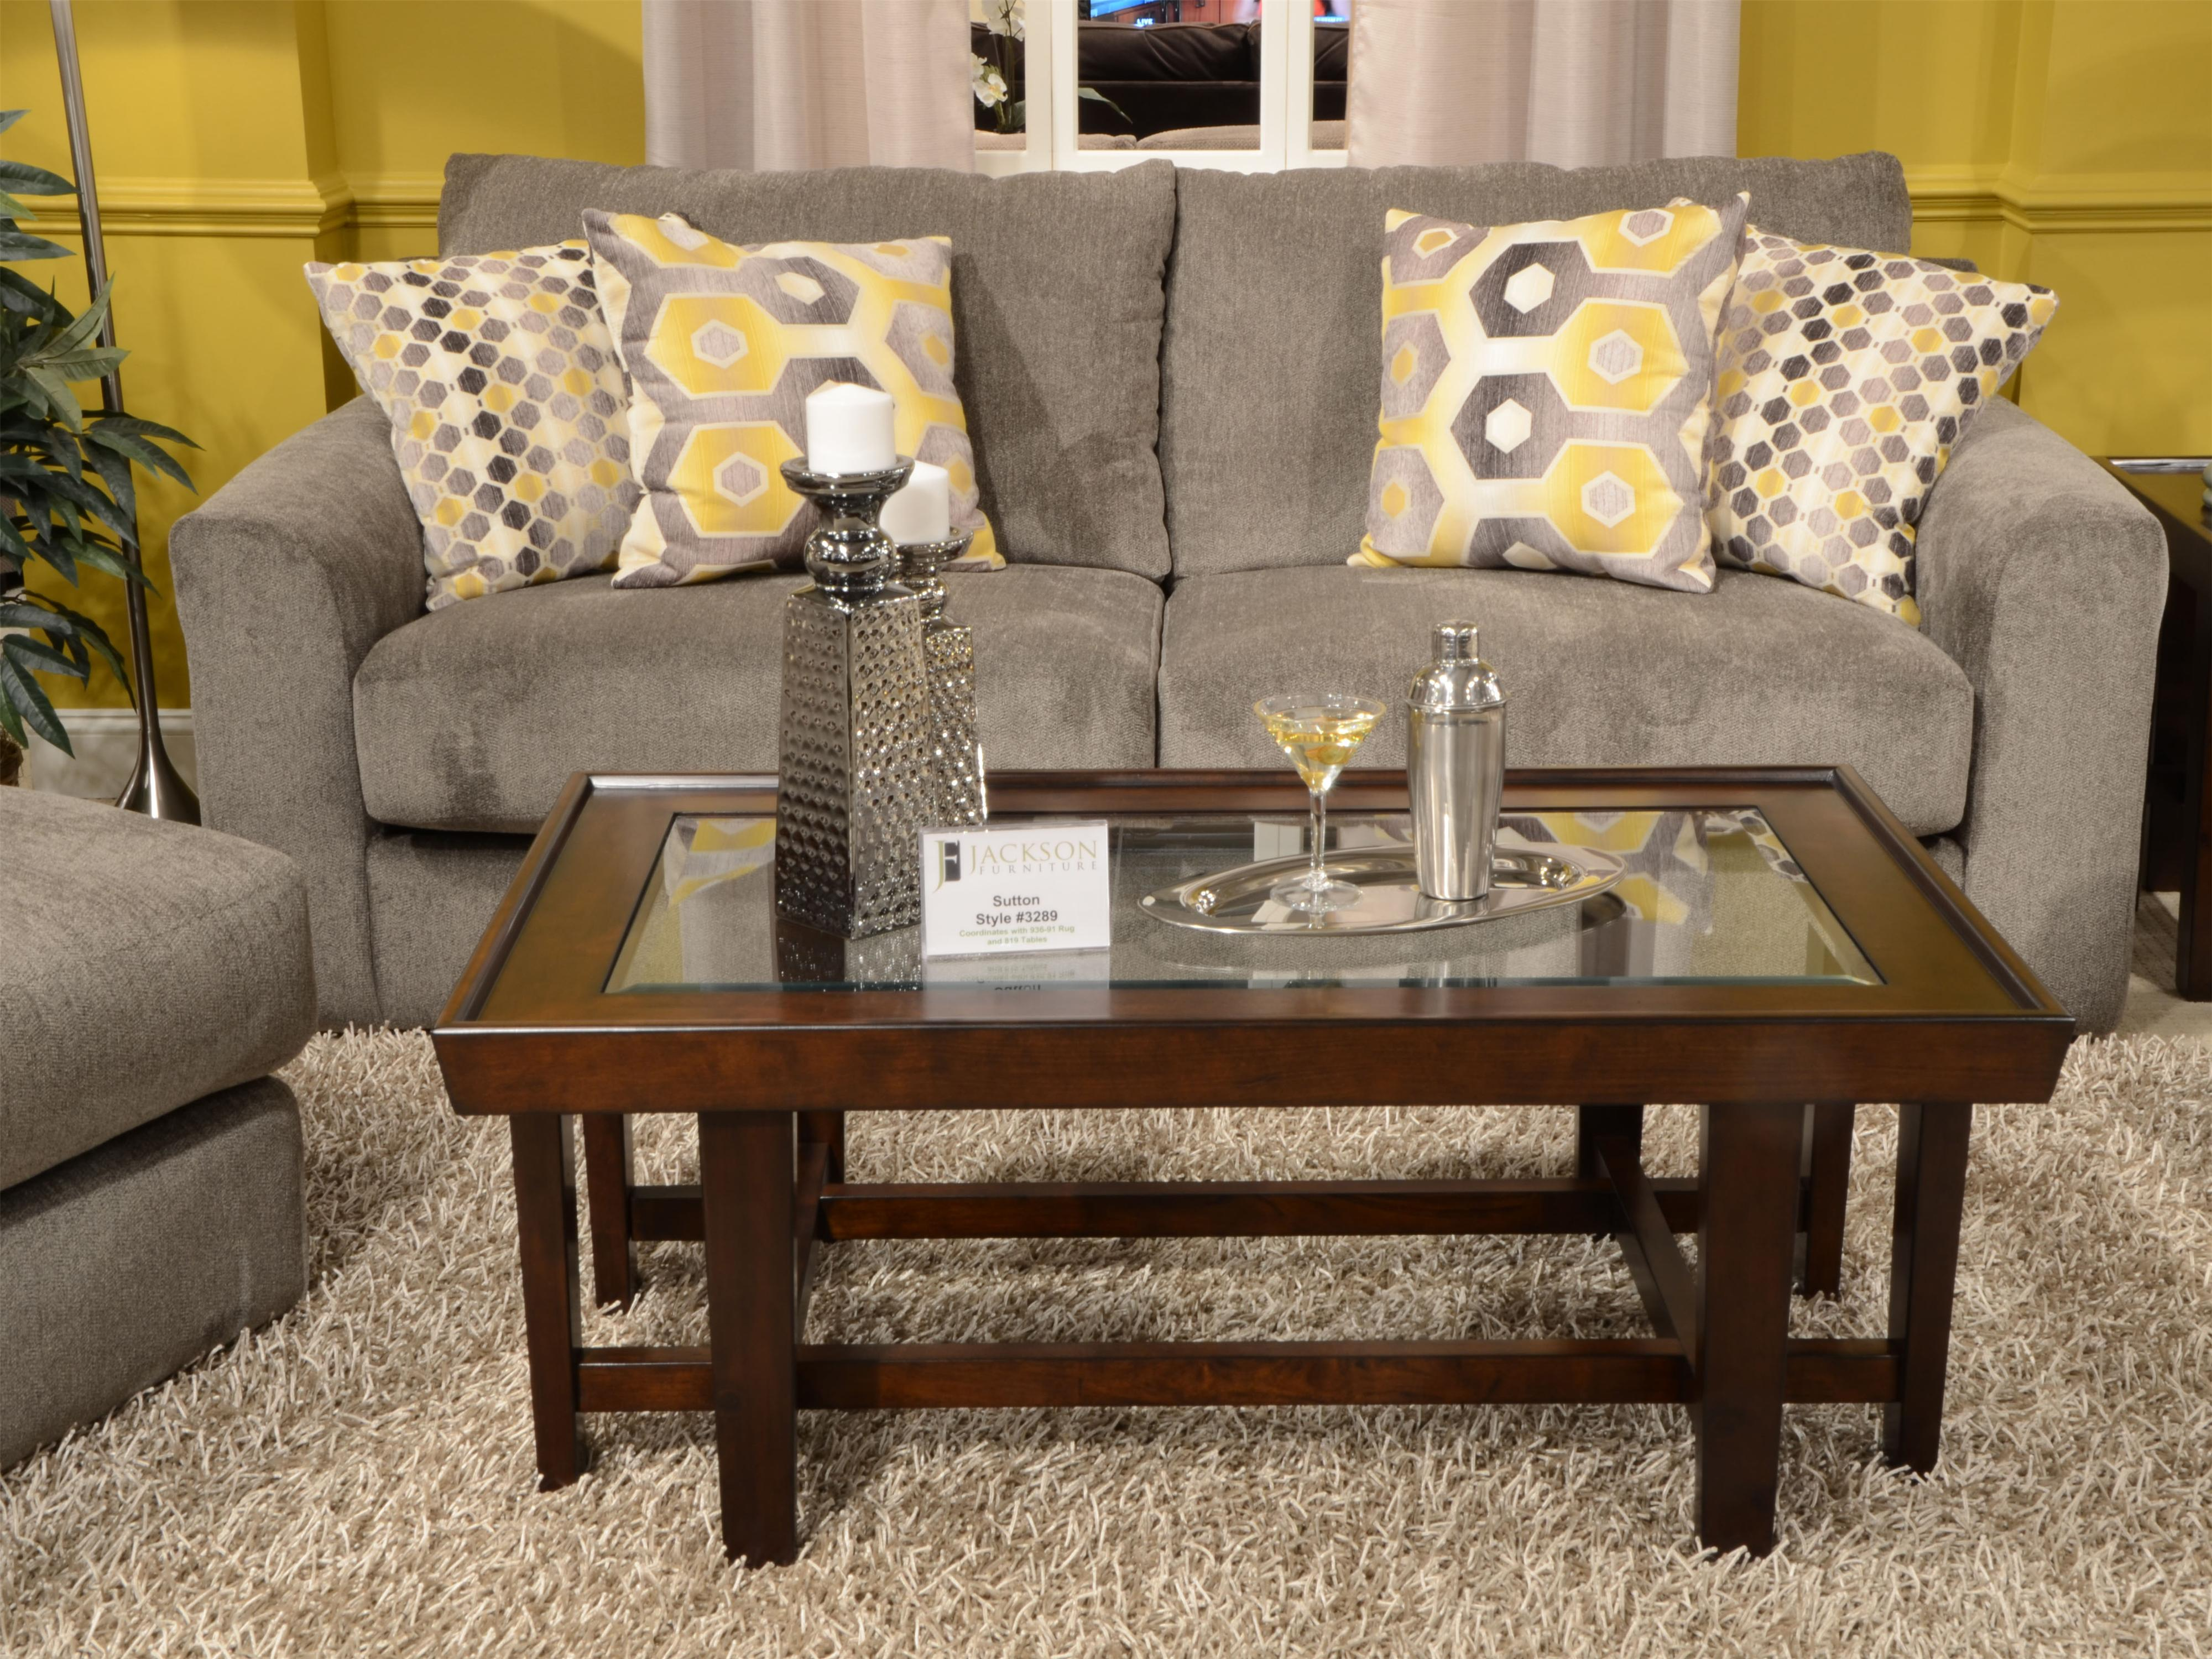 jackson sofa – Home and Textiles